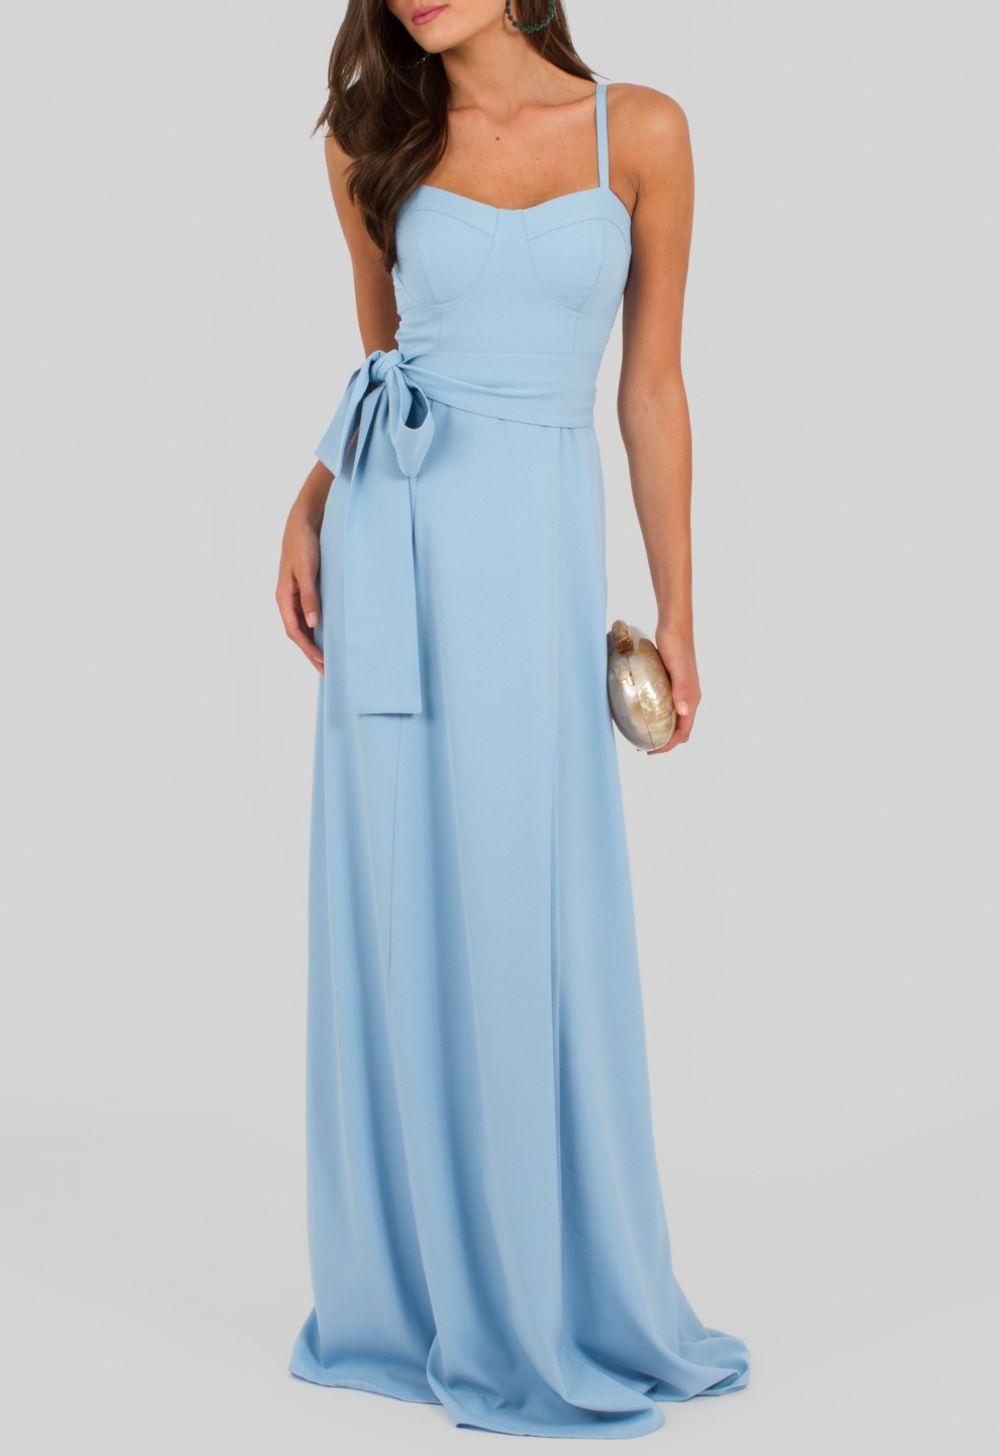 277205043 Vestido longo azul bojo marcado Iorane - powerlook